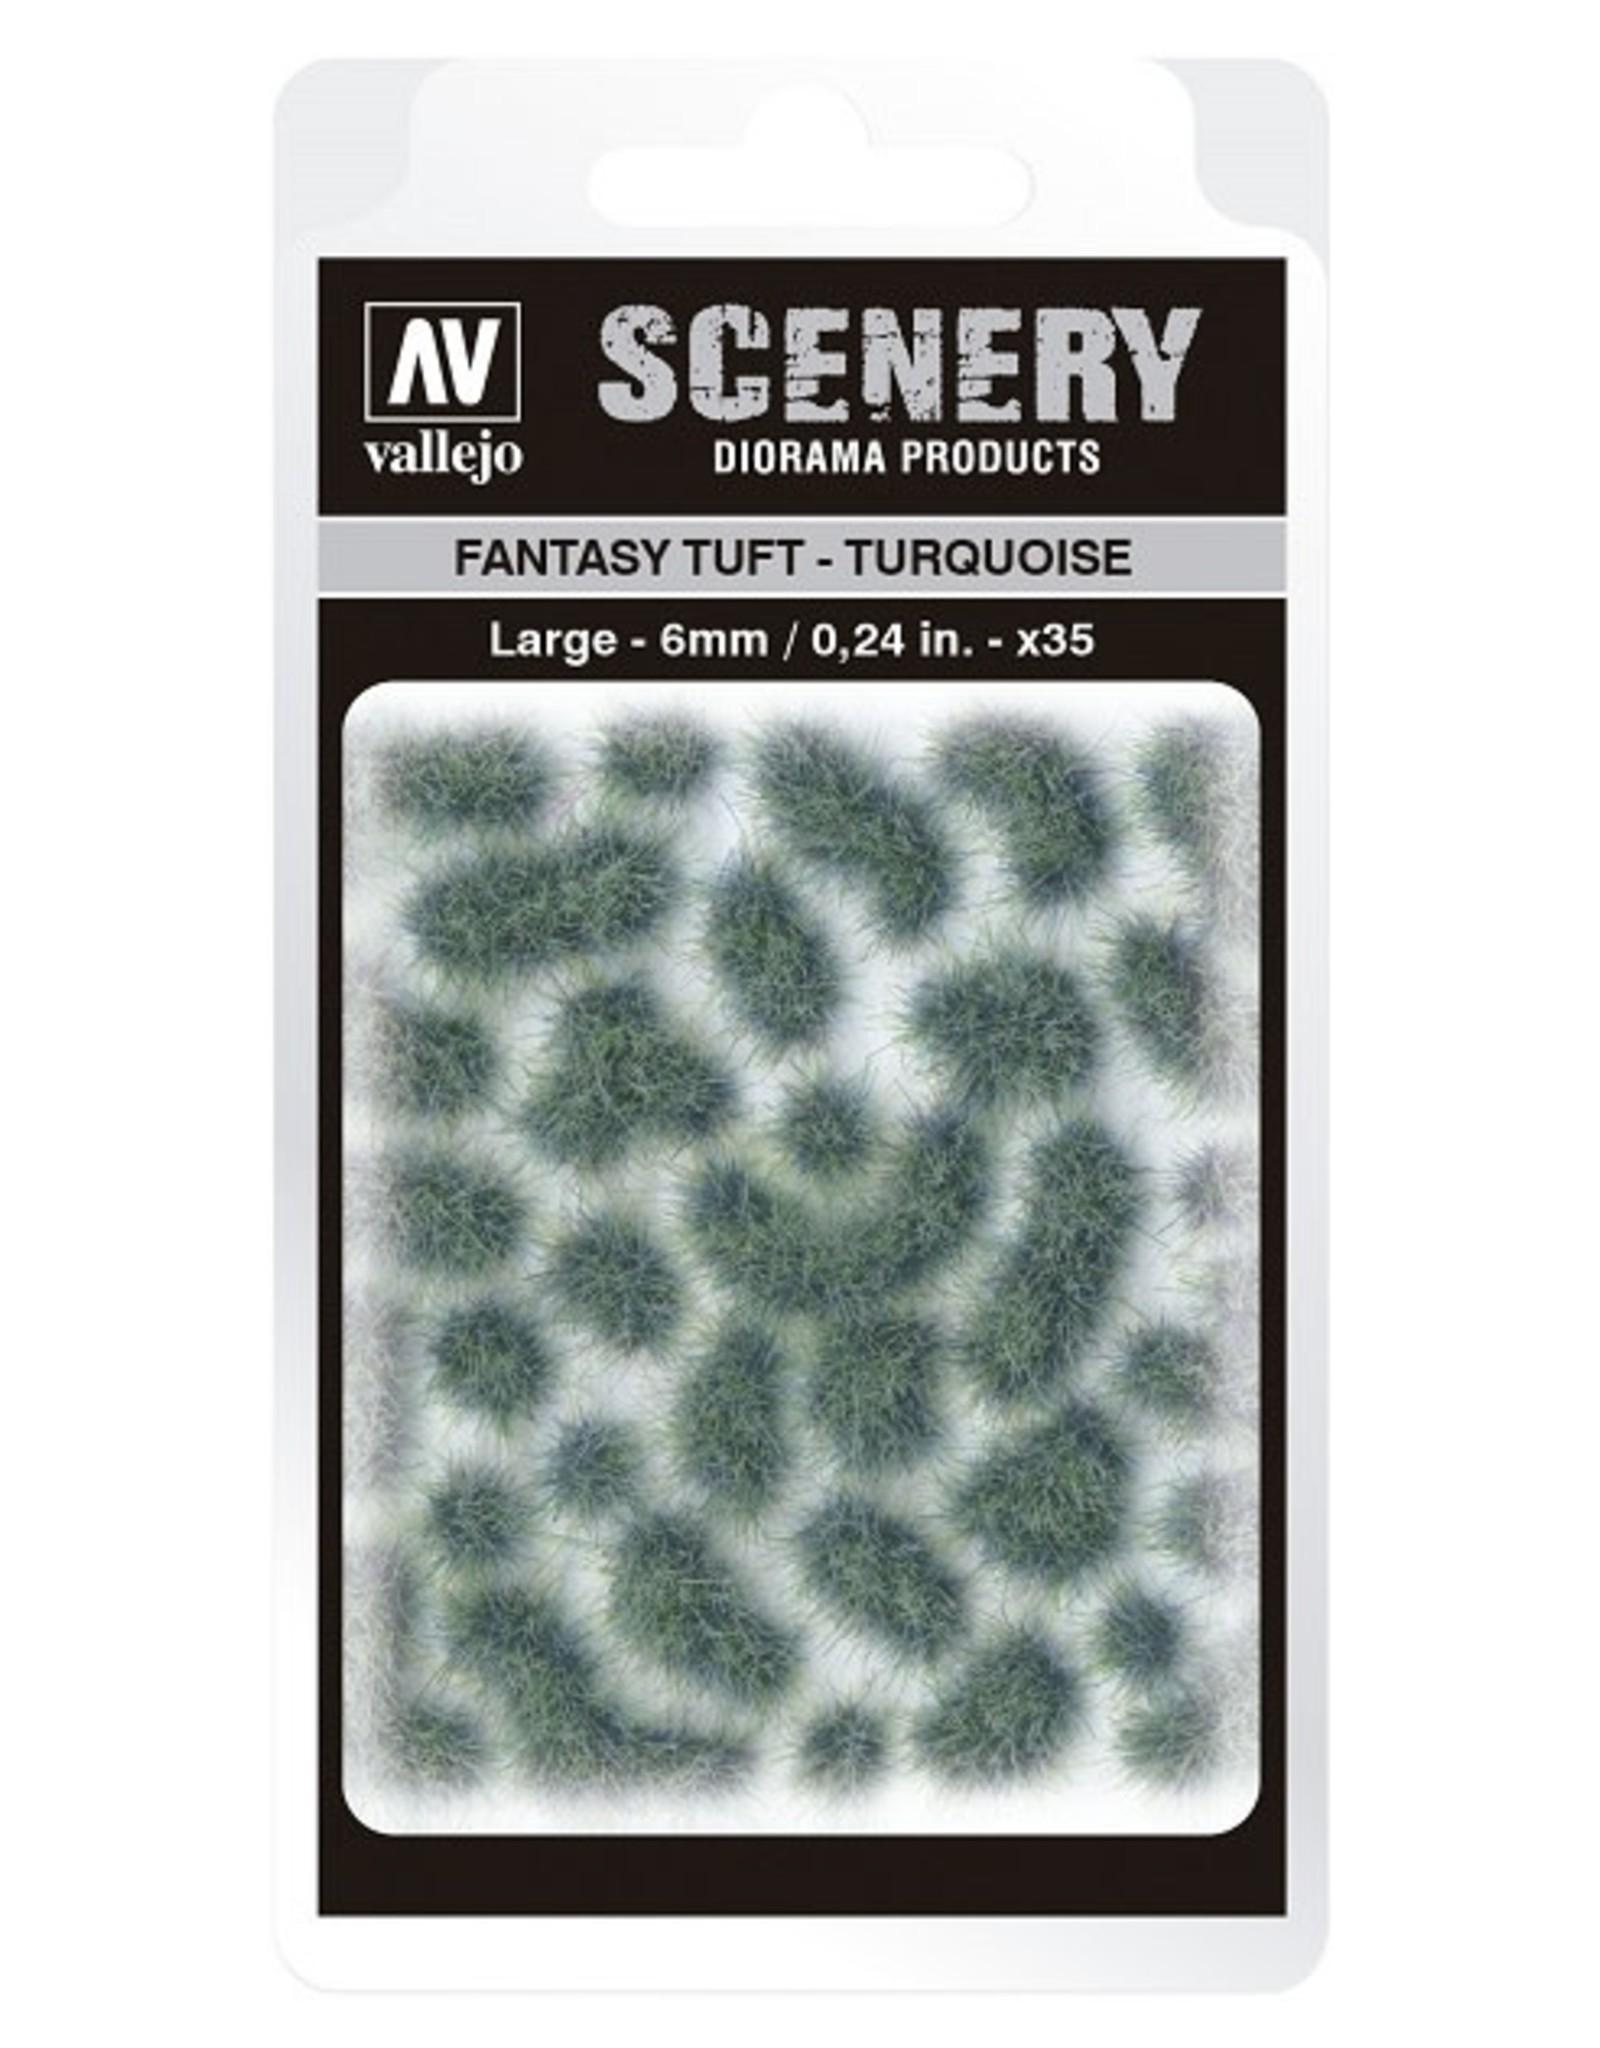 Vallejo Vallejo: Scenery - Fantasy Tuft - Turquoise Large 6mm